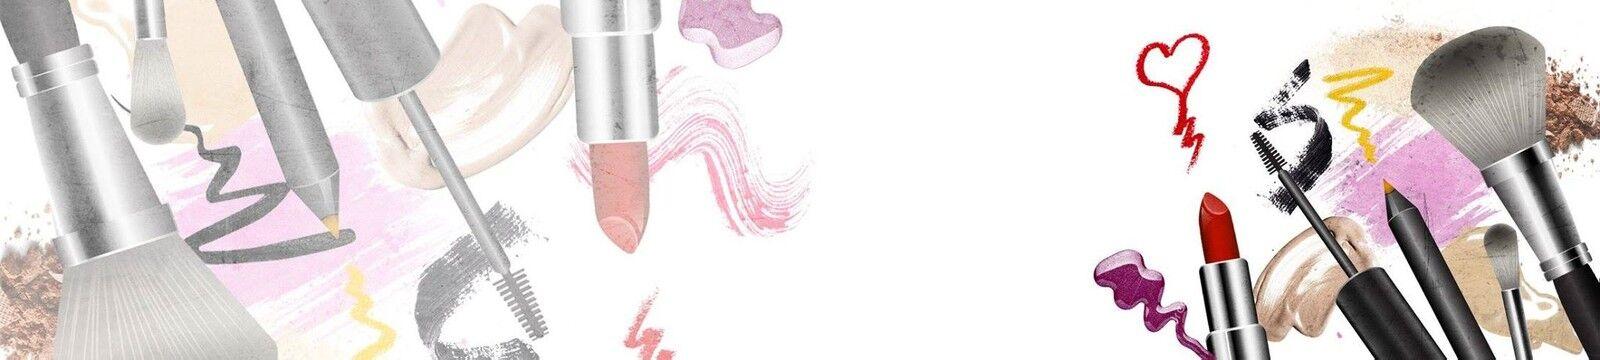 Best Value Cosmetics